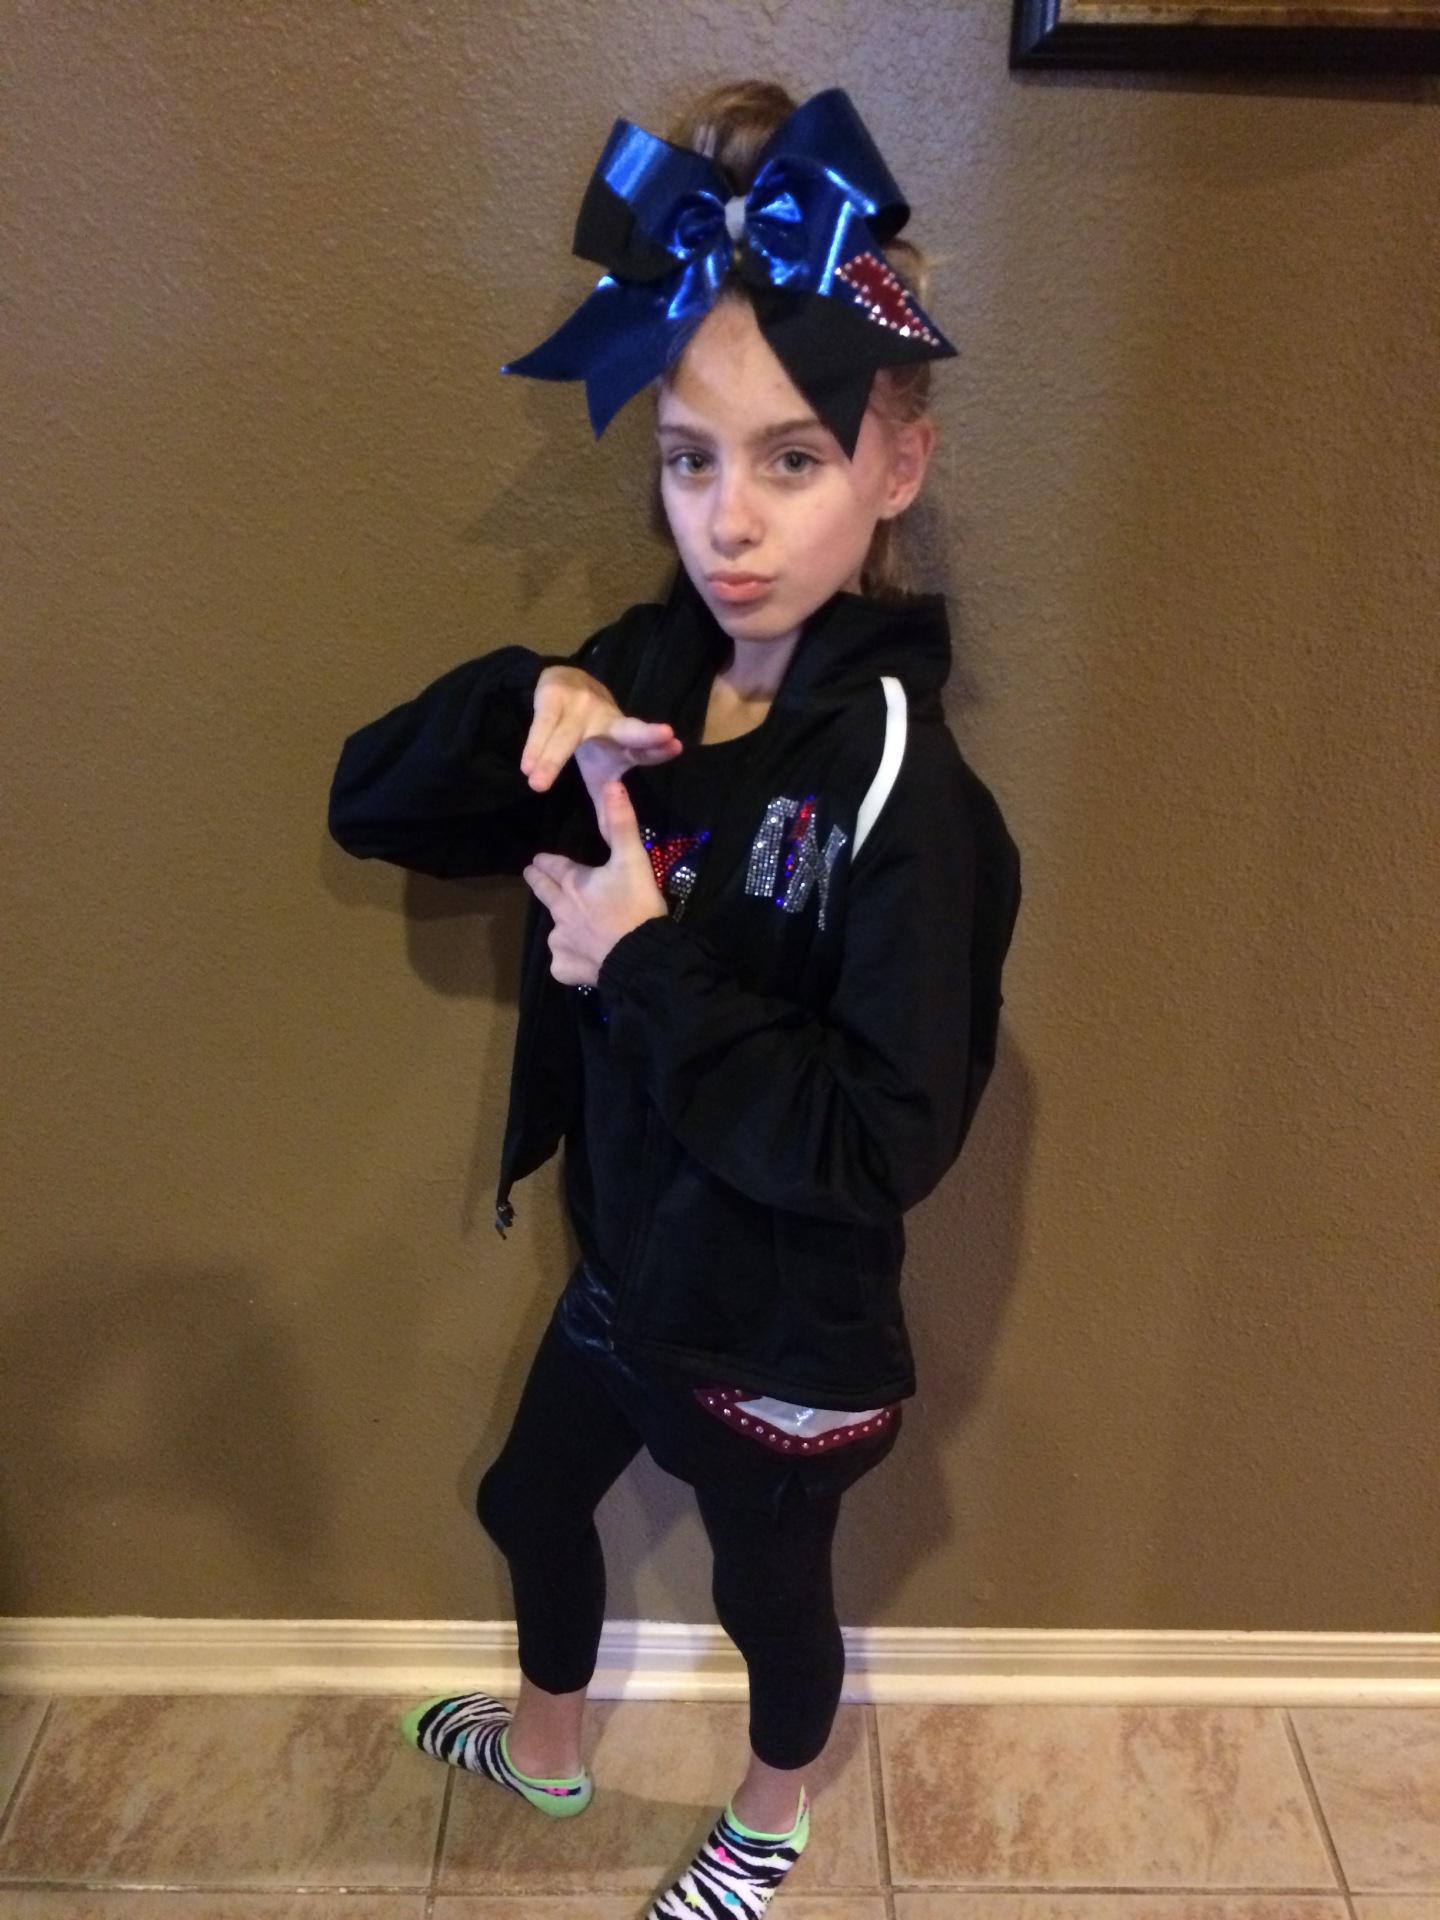 Cheer Ready